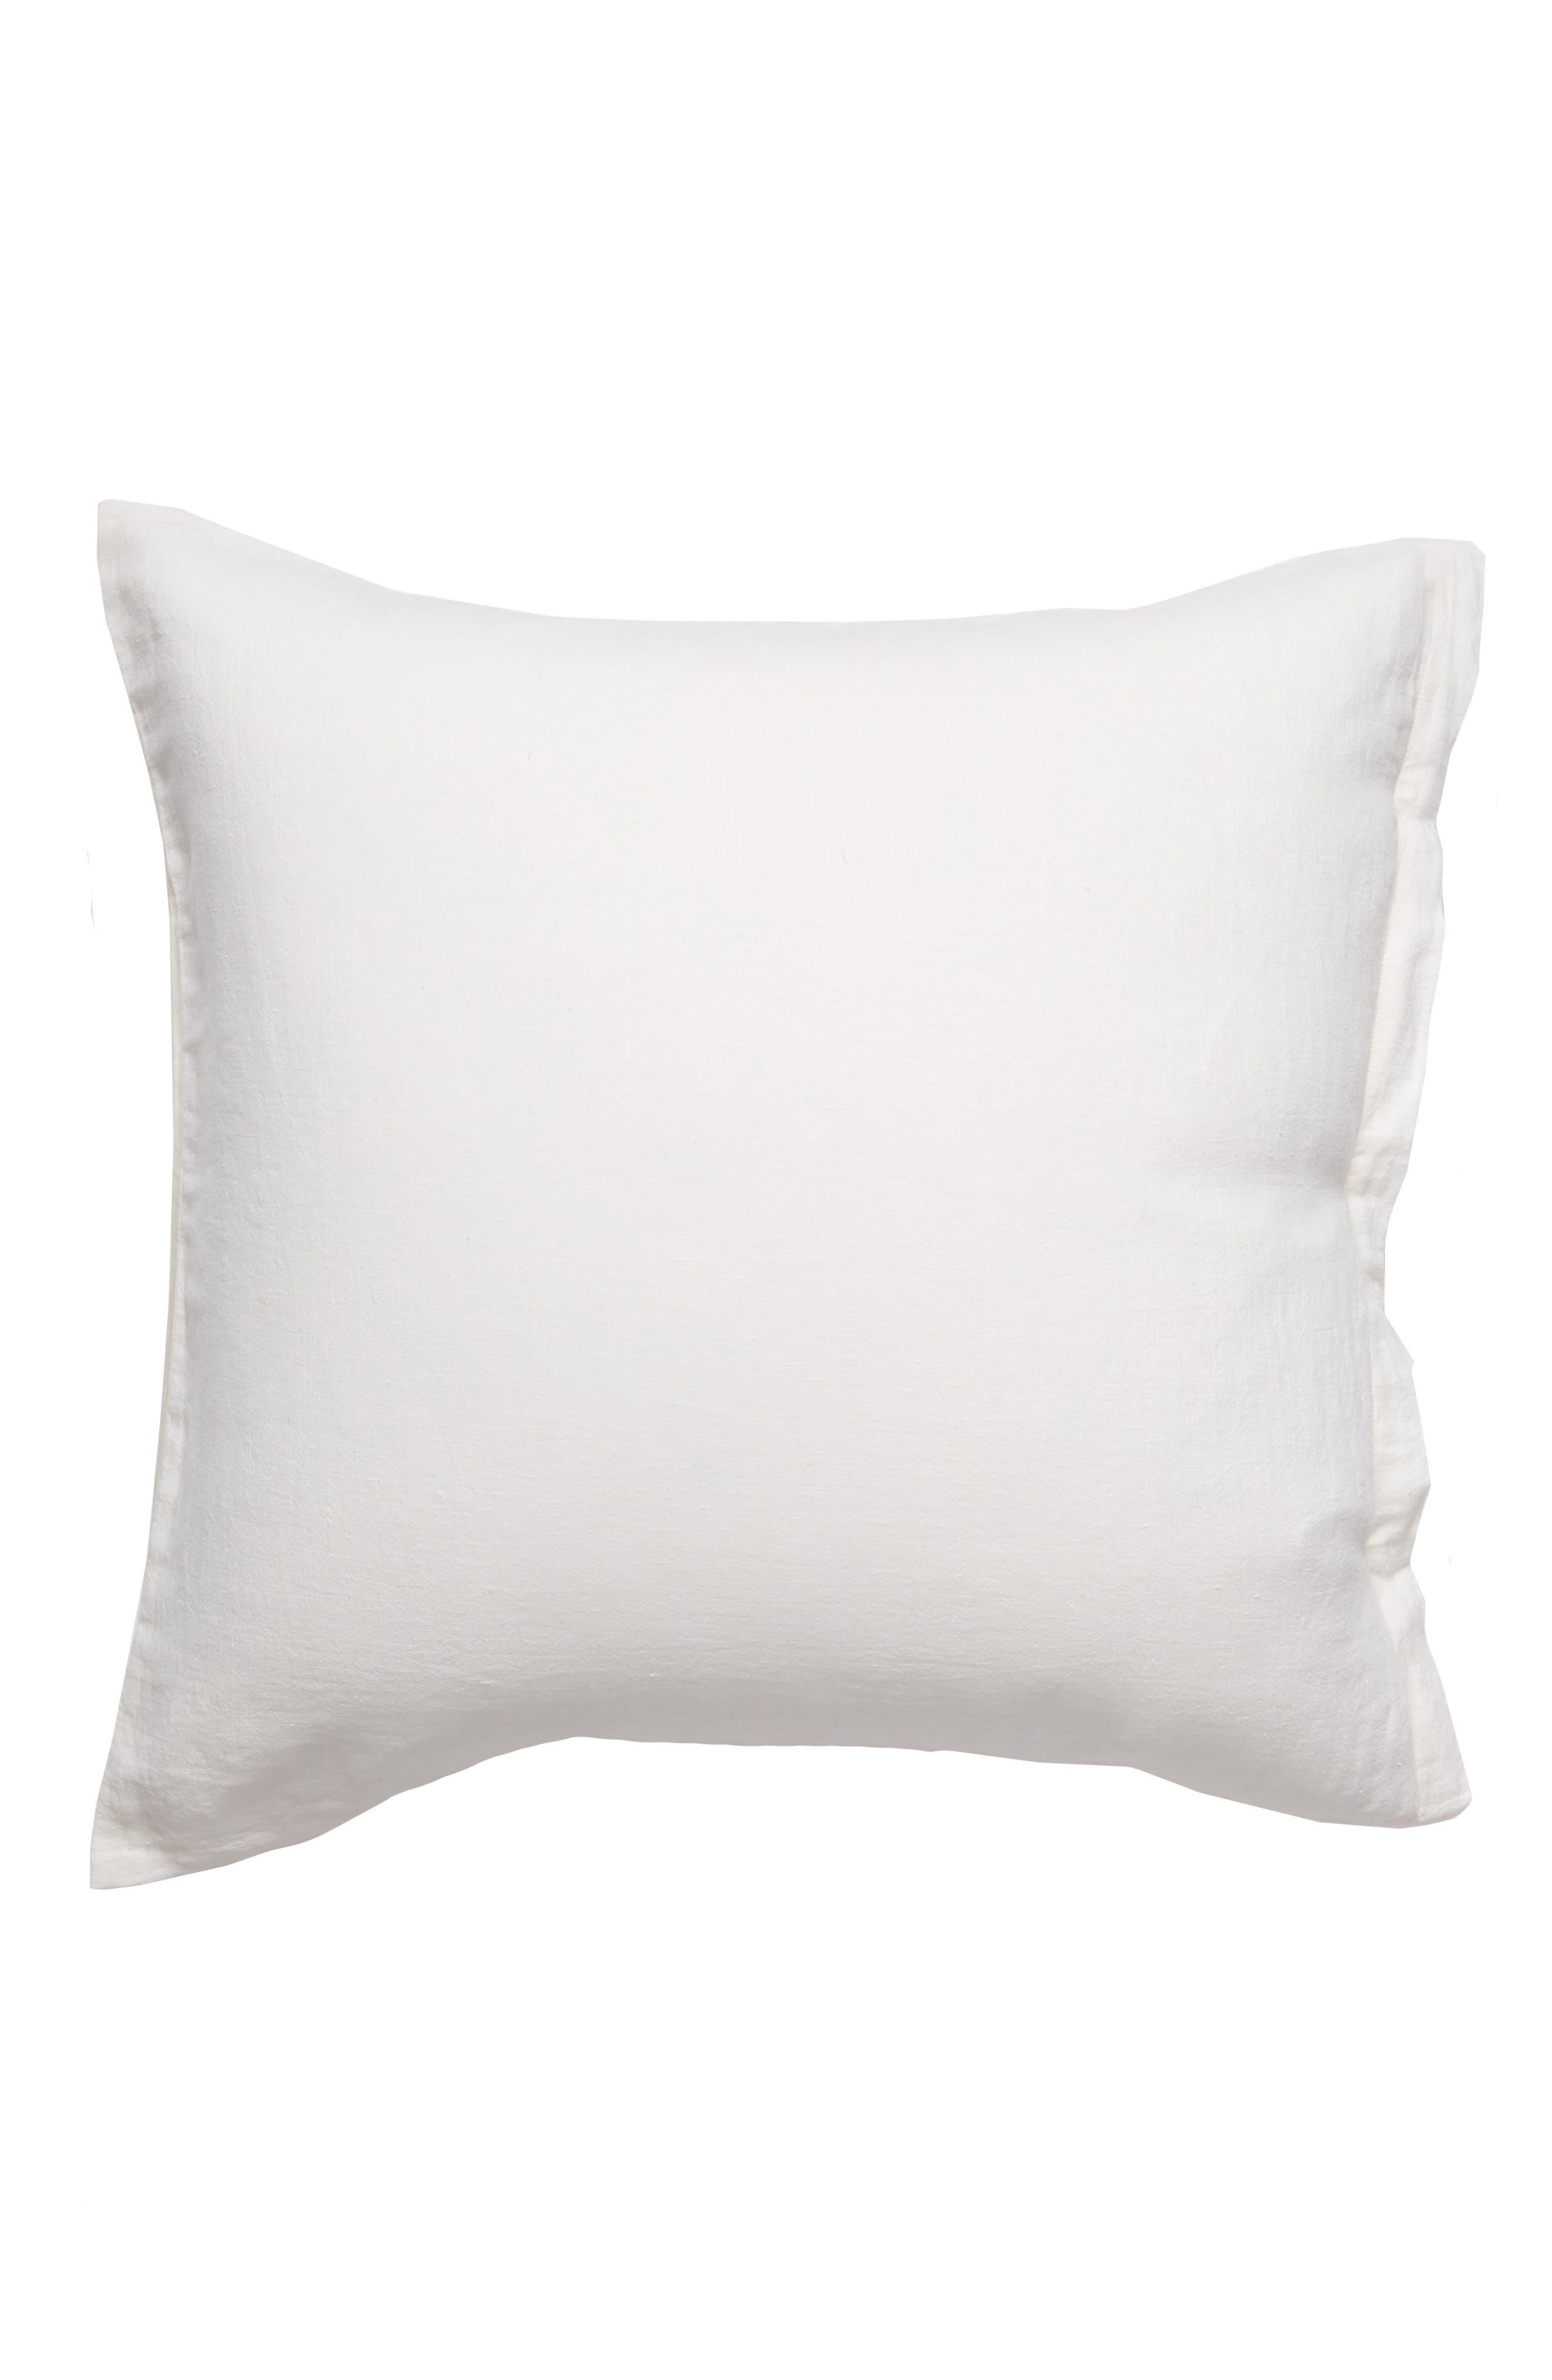 Relaxed Cotton & Linen Euro Sham,                             Main thumbnail 1, color,                             Ivory